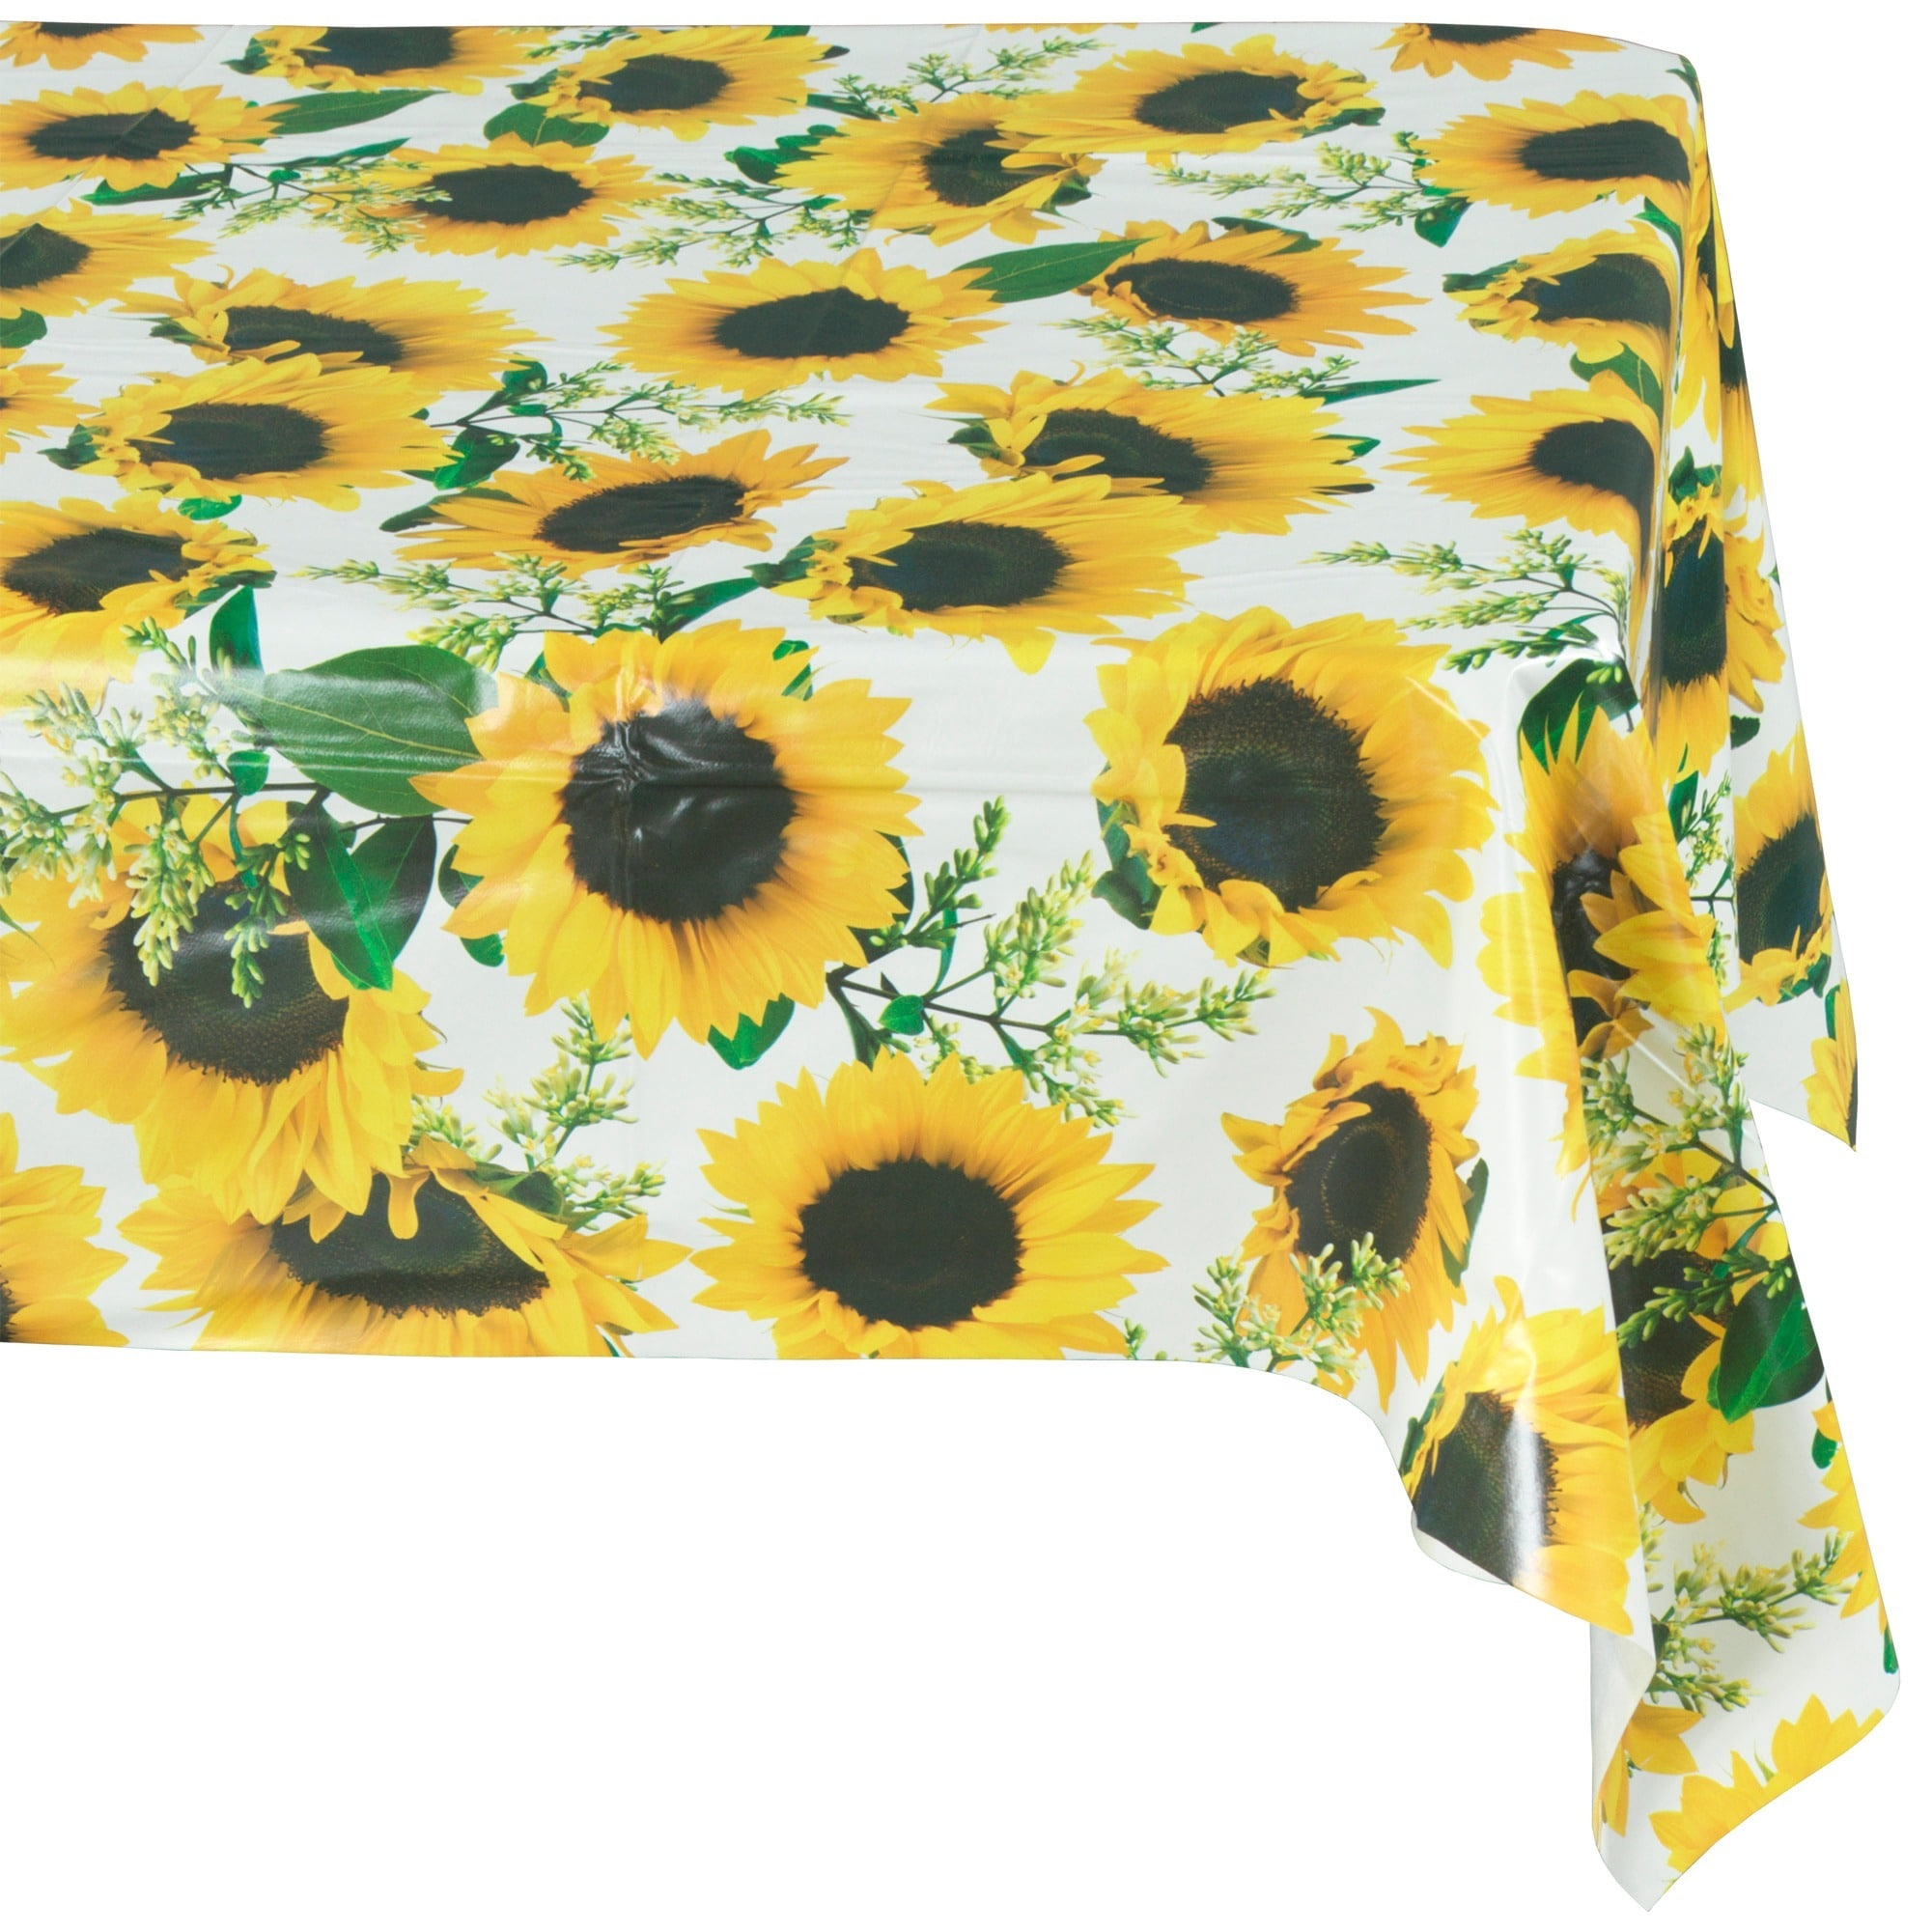 Ottohome Sunflower Design Vinyl Non-woven 55-inch x 70-in...